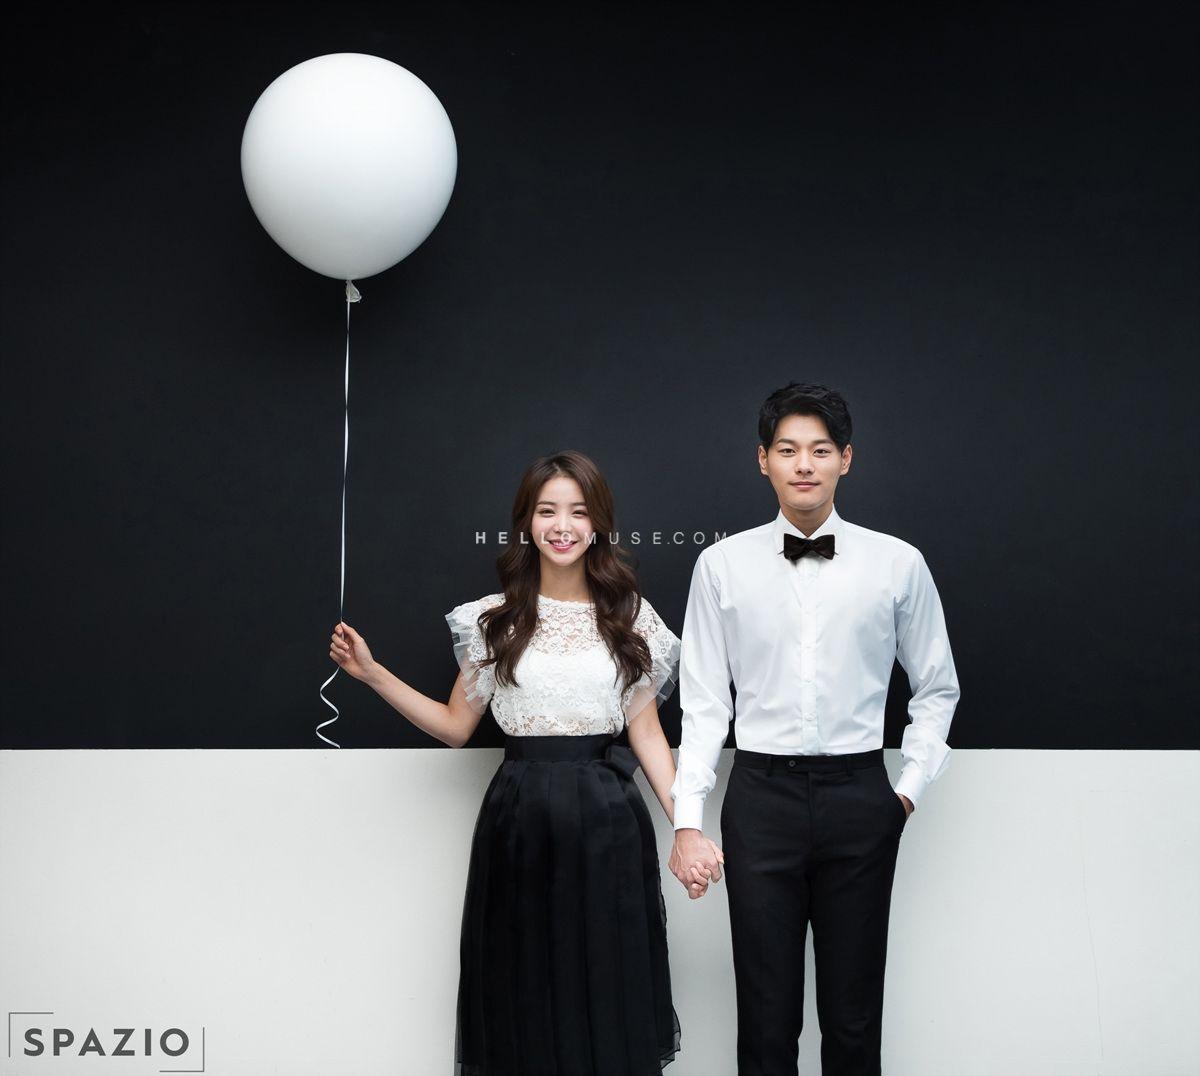 PRE WEDDING  NEW SAMPLE 2018  HelloMuse com   Korea Pre Wedding Promotion is part of Wedding photo studio -